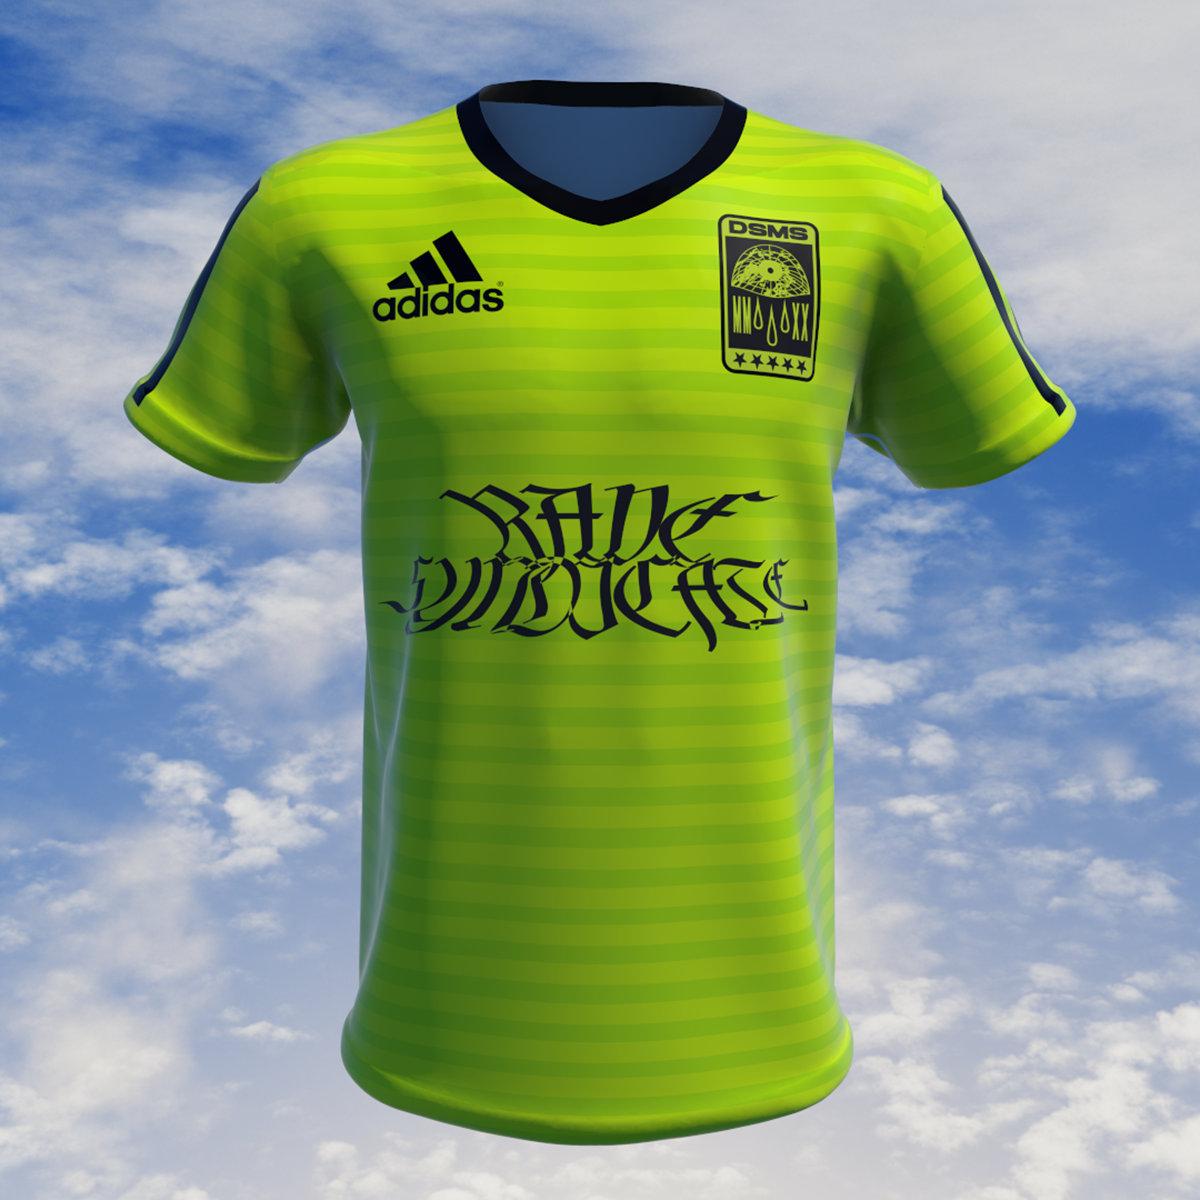 DSMS Rave Syndicate Adidas Climalite Jersey Neon   Deep Sea Mining ...